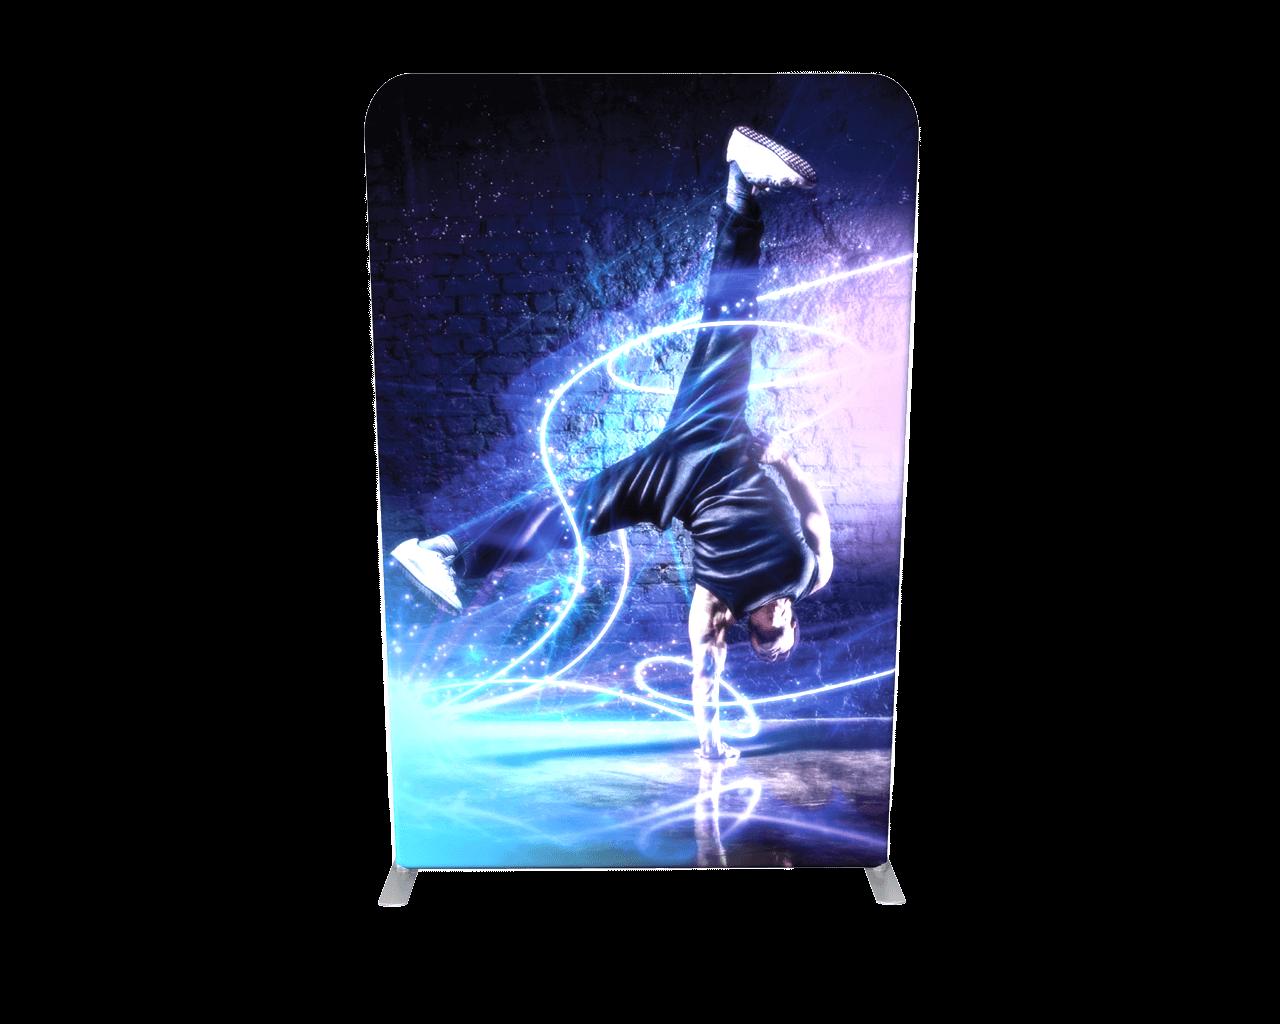 Wavelight 5ft Backlit Panel